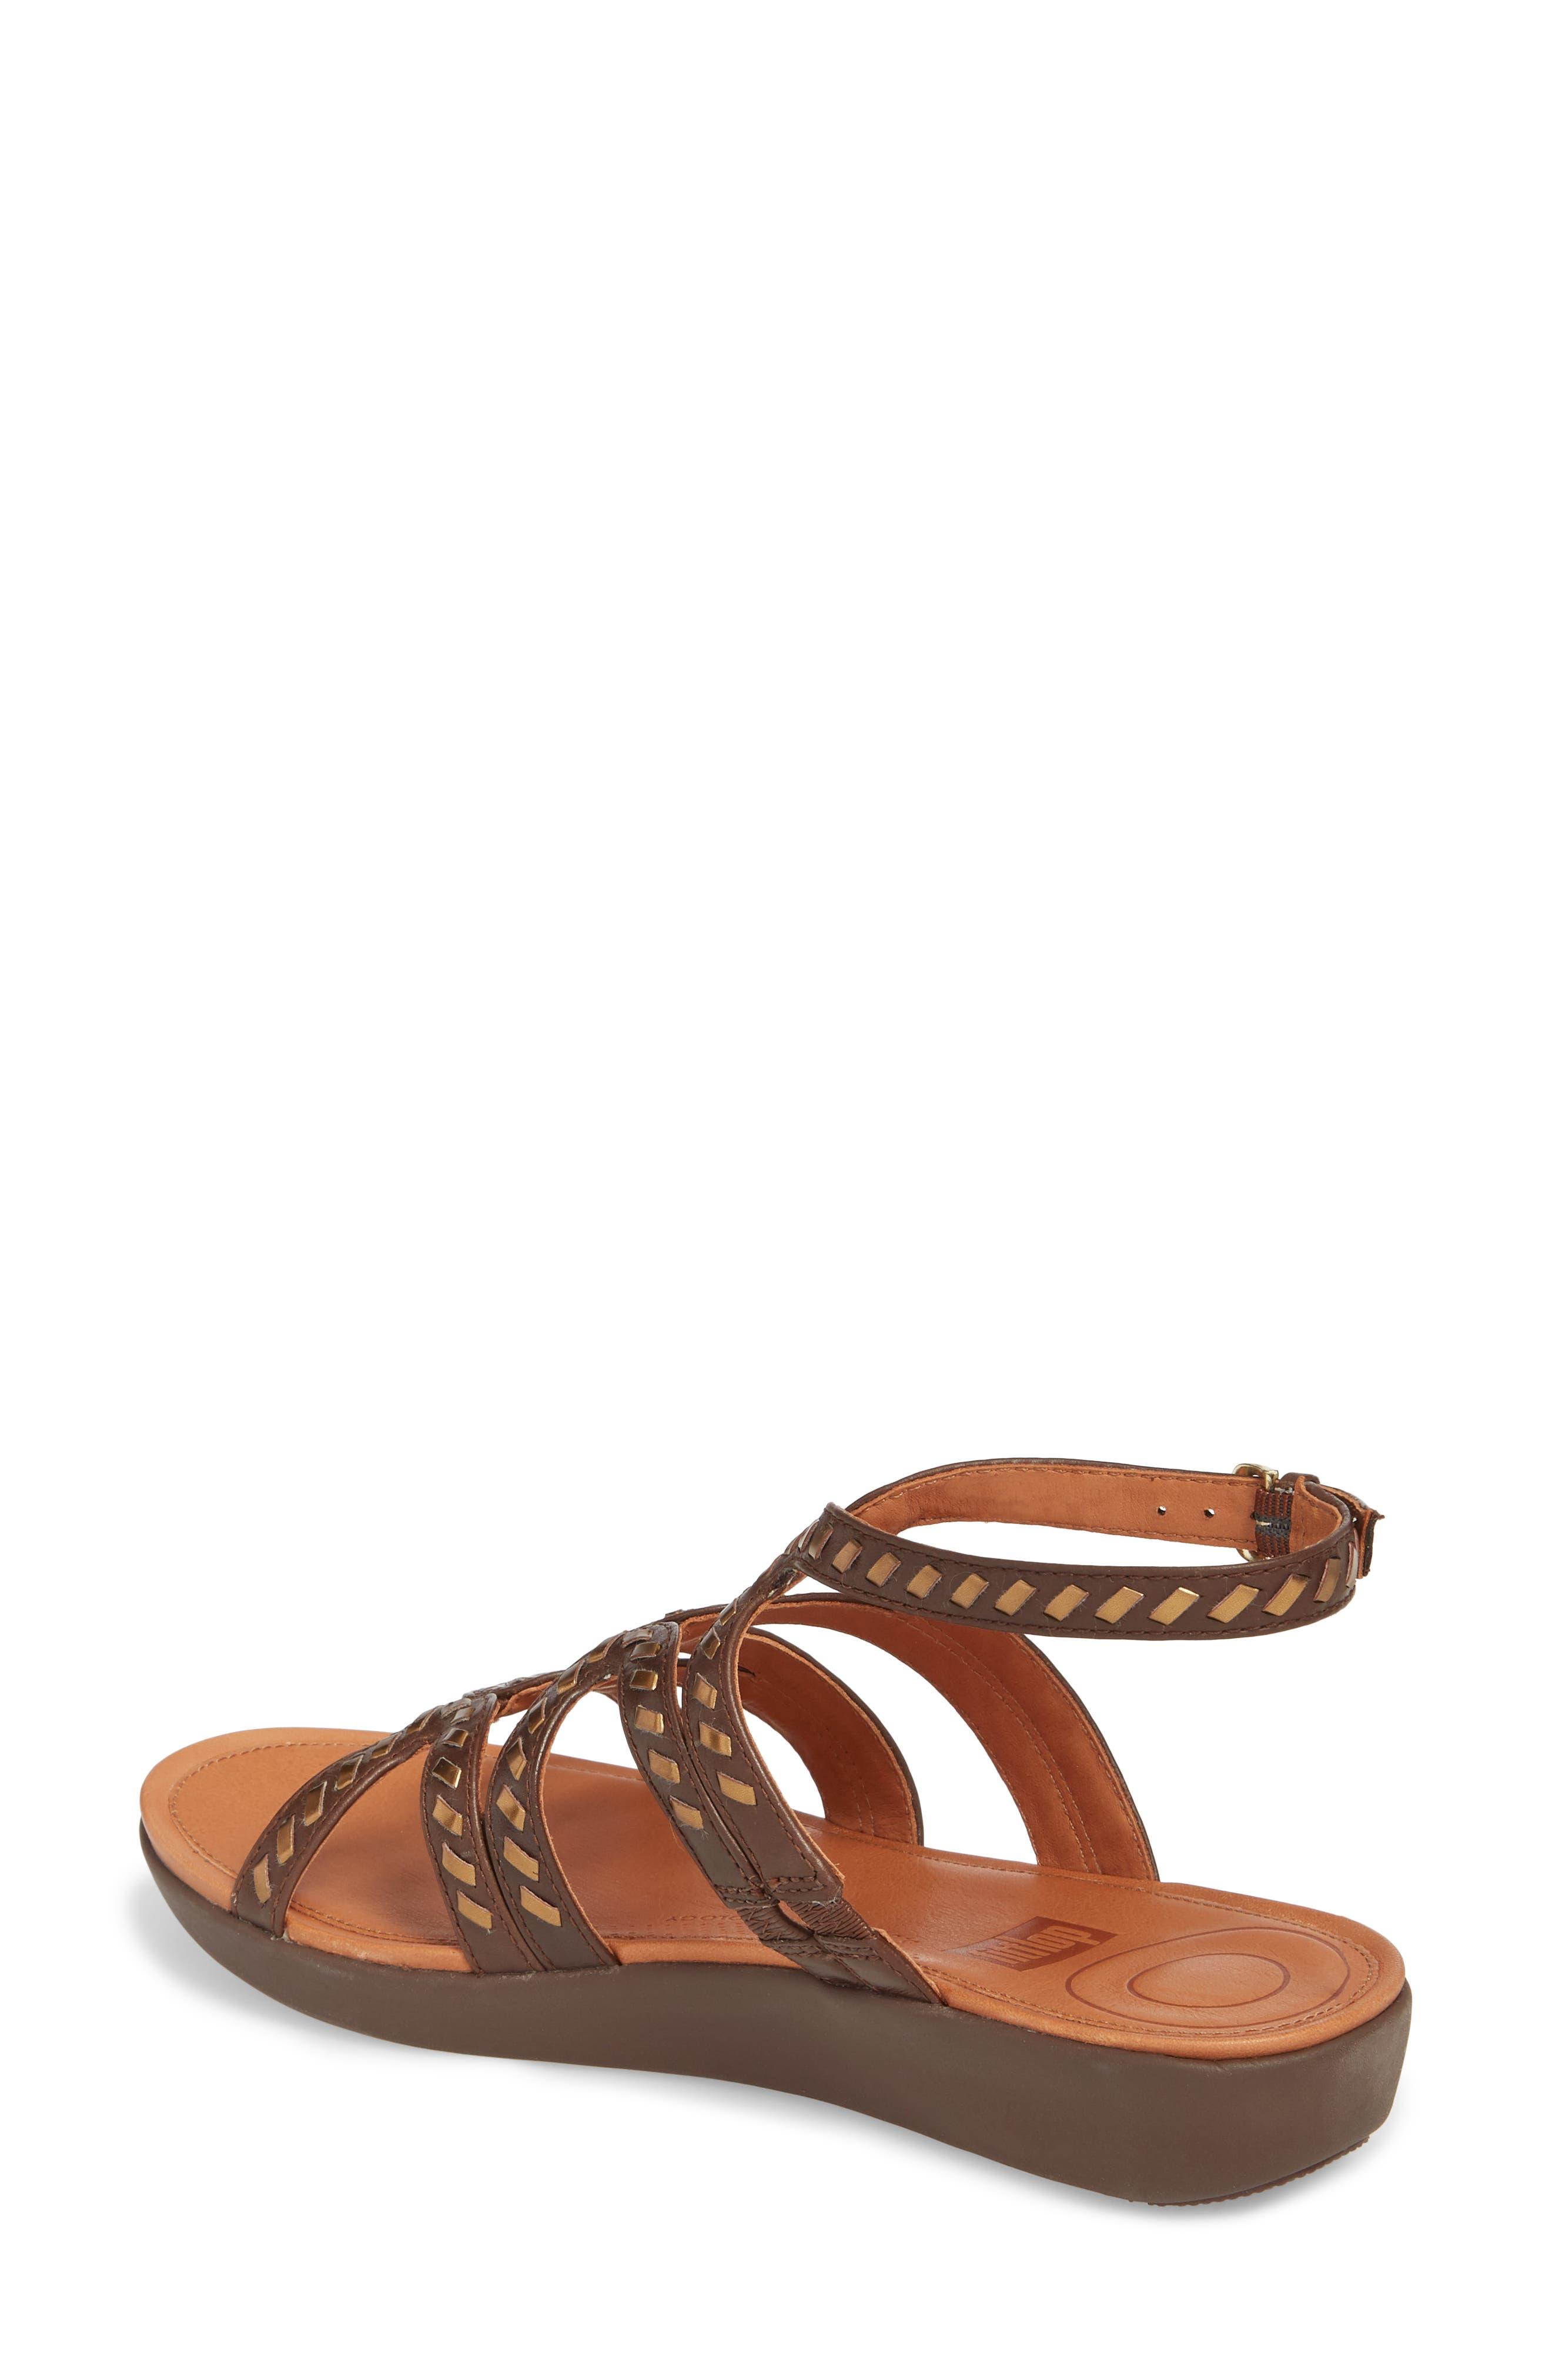 Strata Gladiator Sandal,                             Alternate thumbnail 2, color,                             200